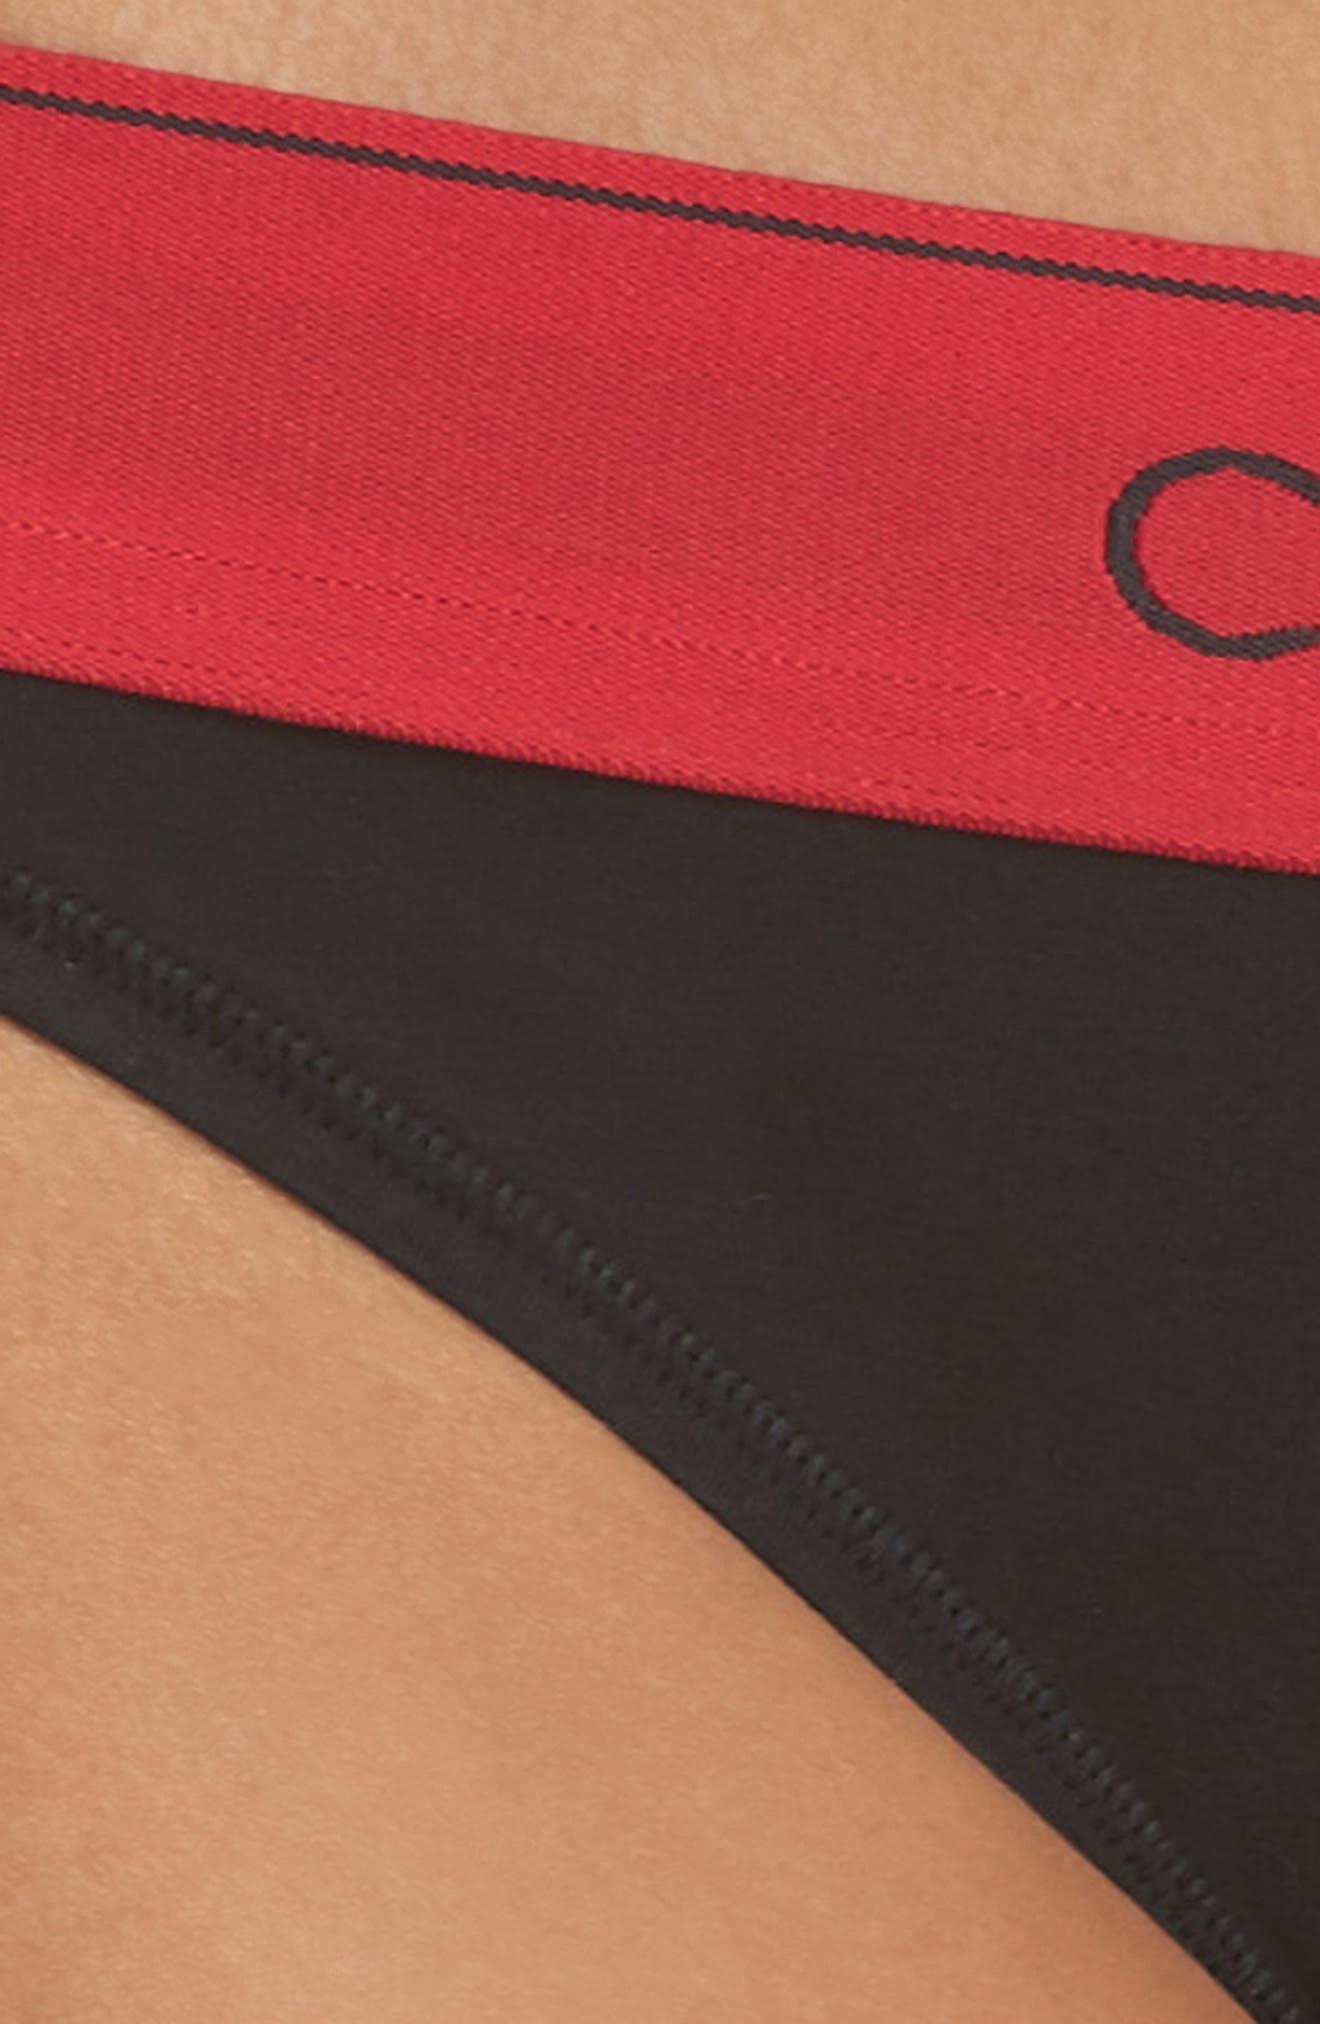 'Modern Cotton Collection' Cotton Blend Bikini,                             Alternate thumbnail 4, color,                             Black Empower